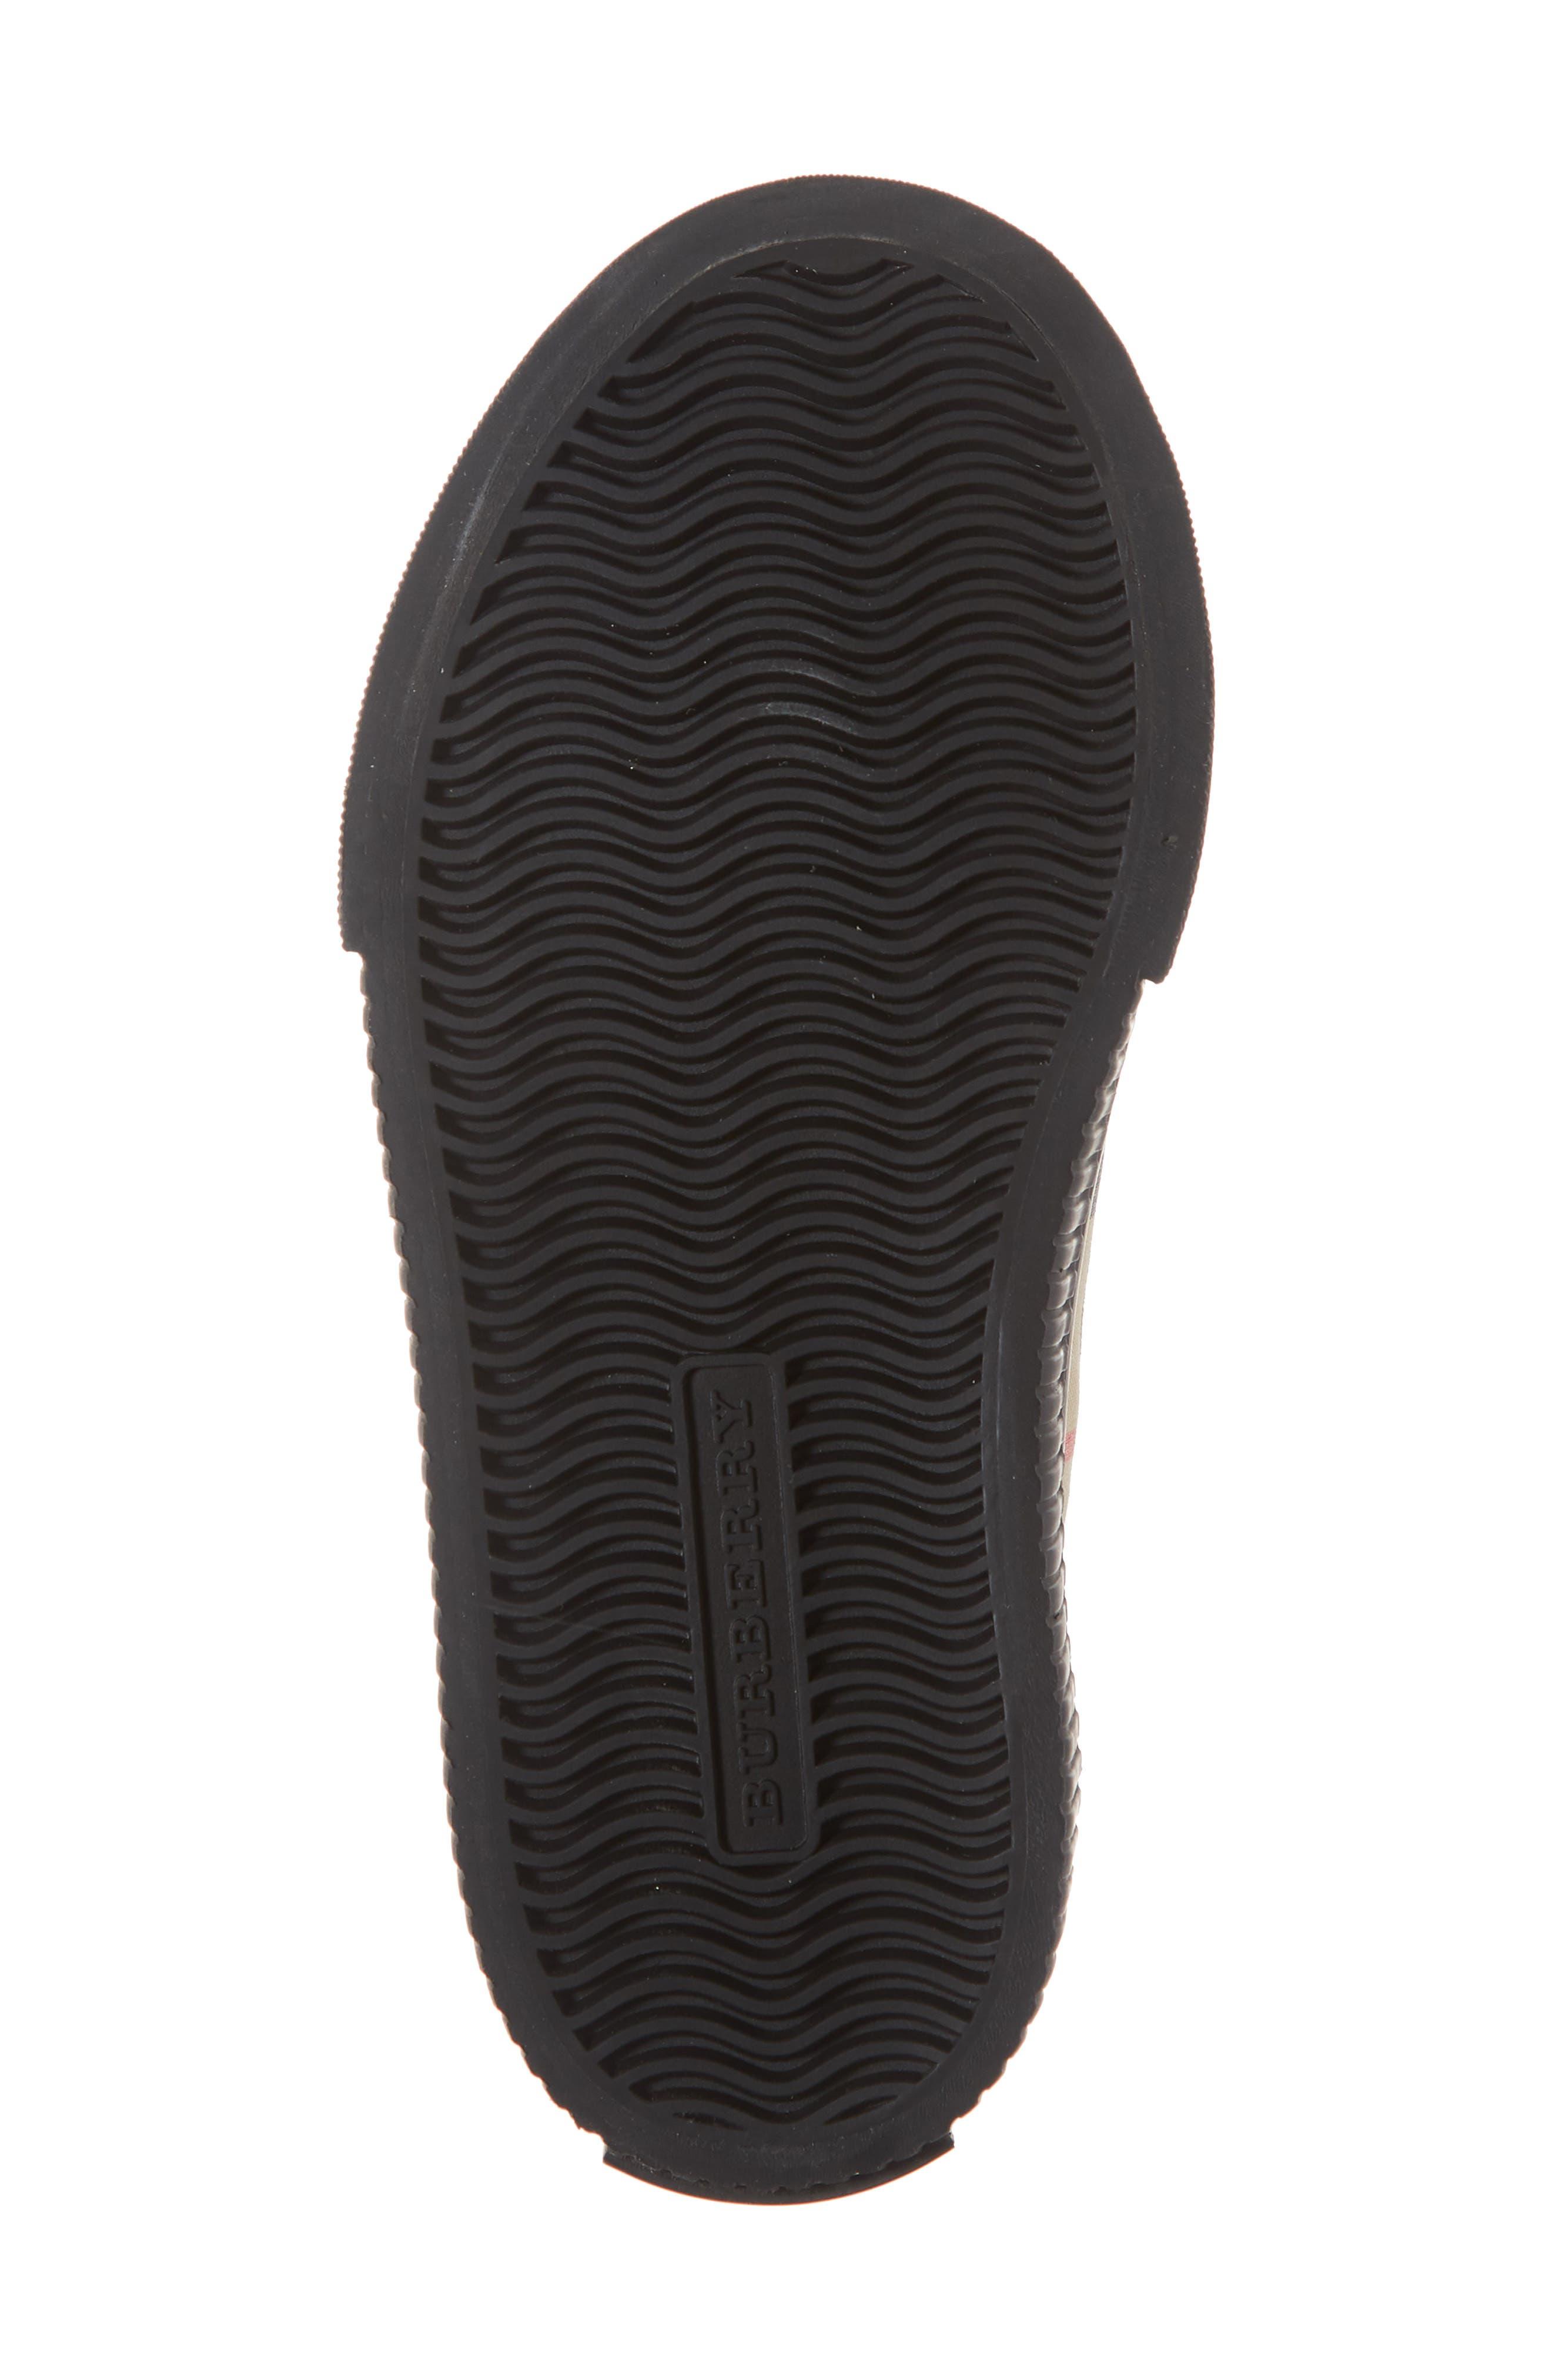 Belside Sneaker,                             Alternate thumbnail 6, color,                             ANTIQUE YELLOW/ BLACK